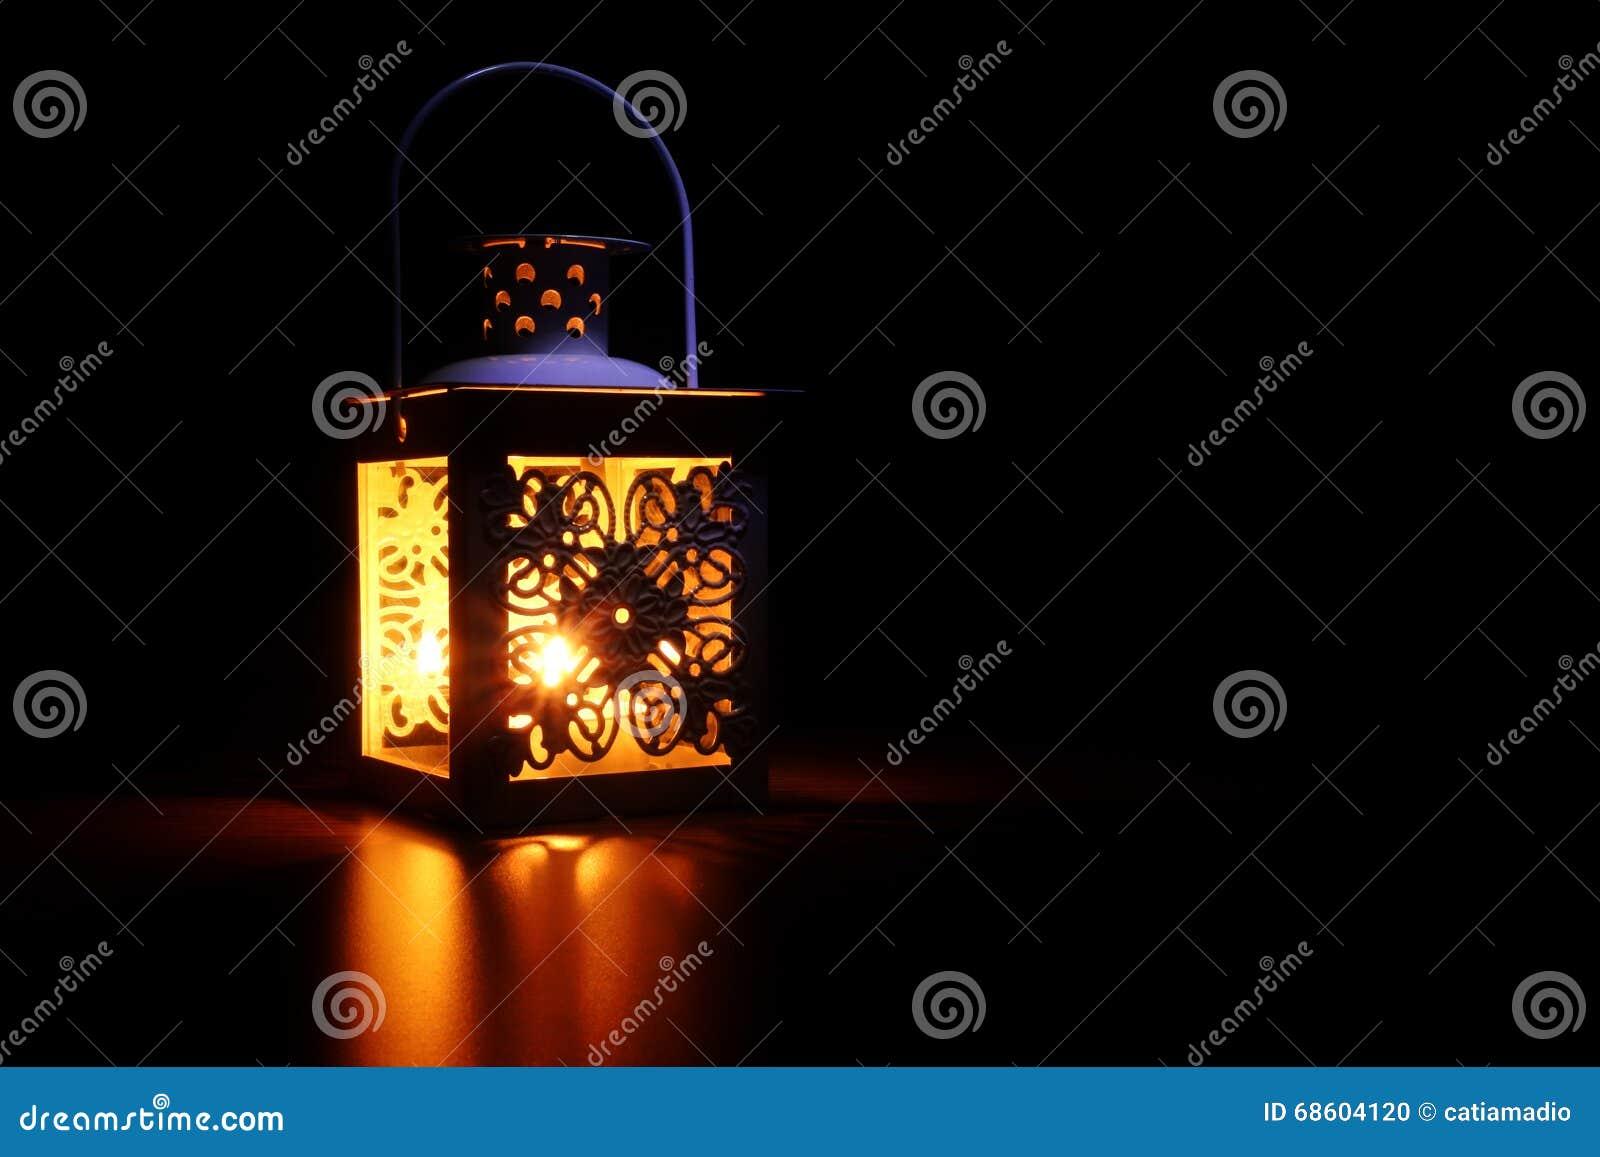 Lantern soft light